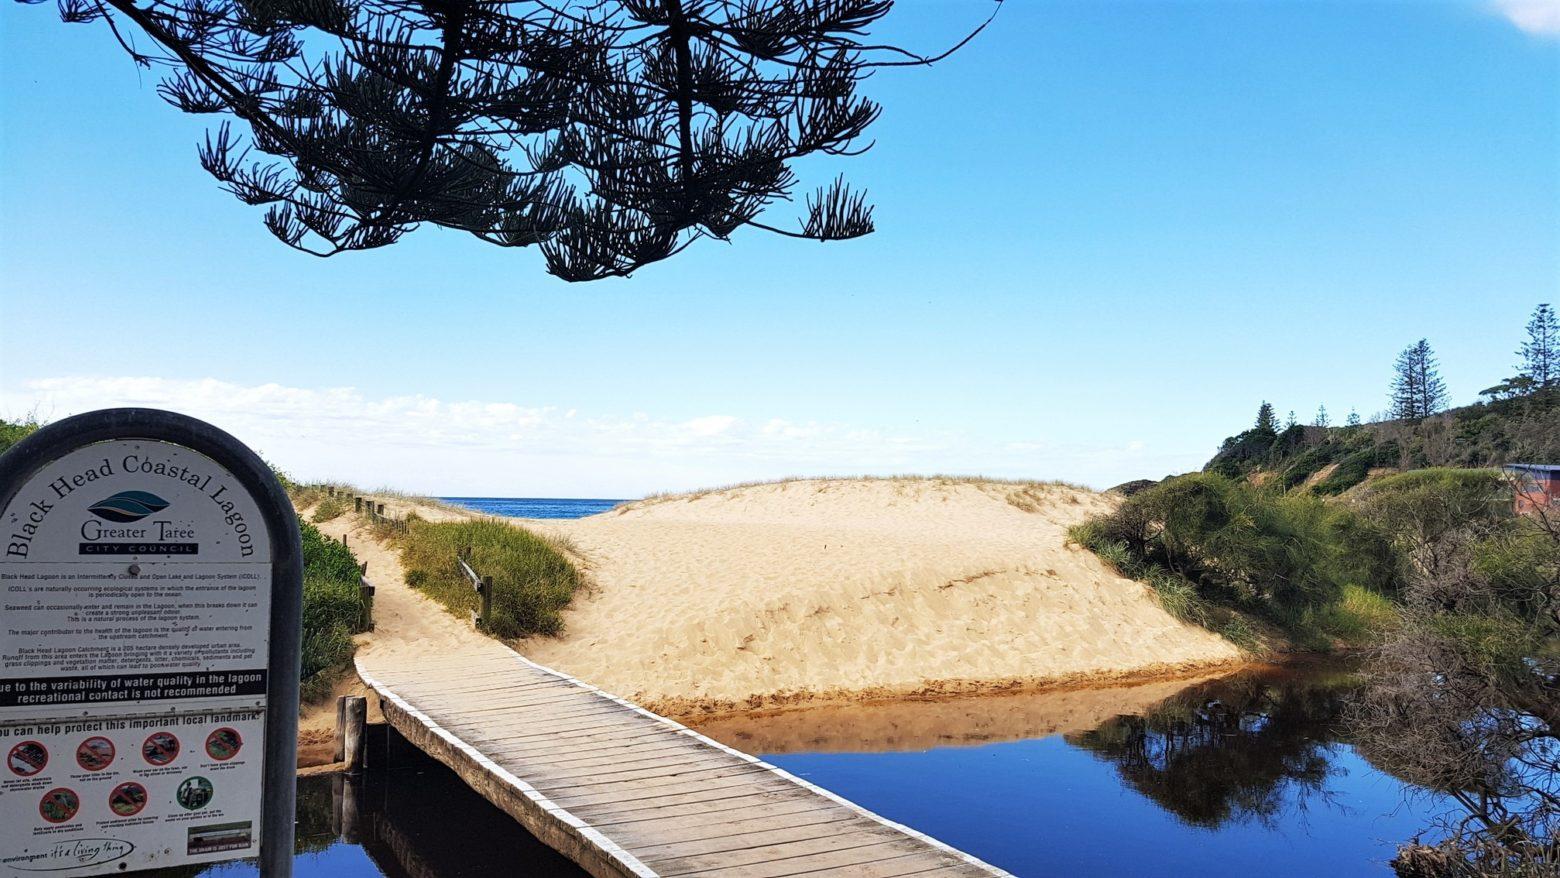 Cross the footbridge onto the dunes of Black Head beach.